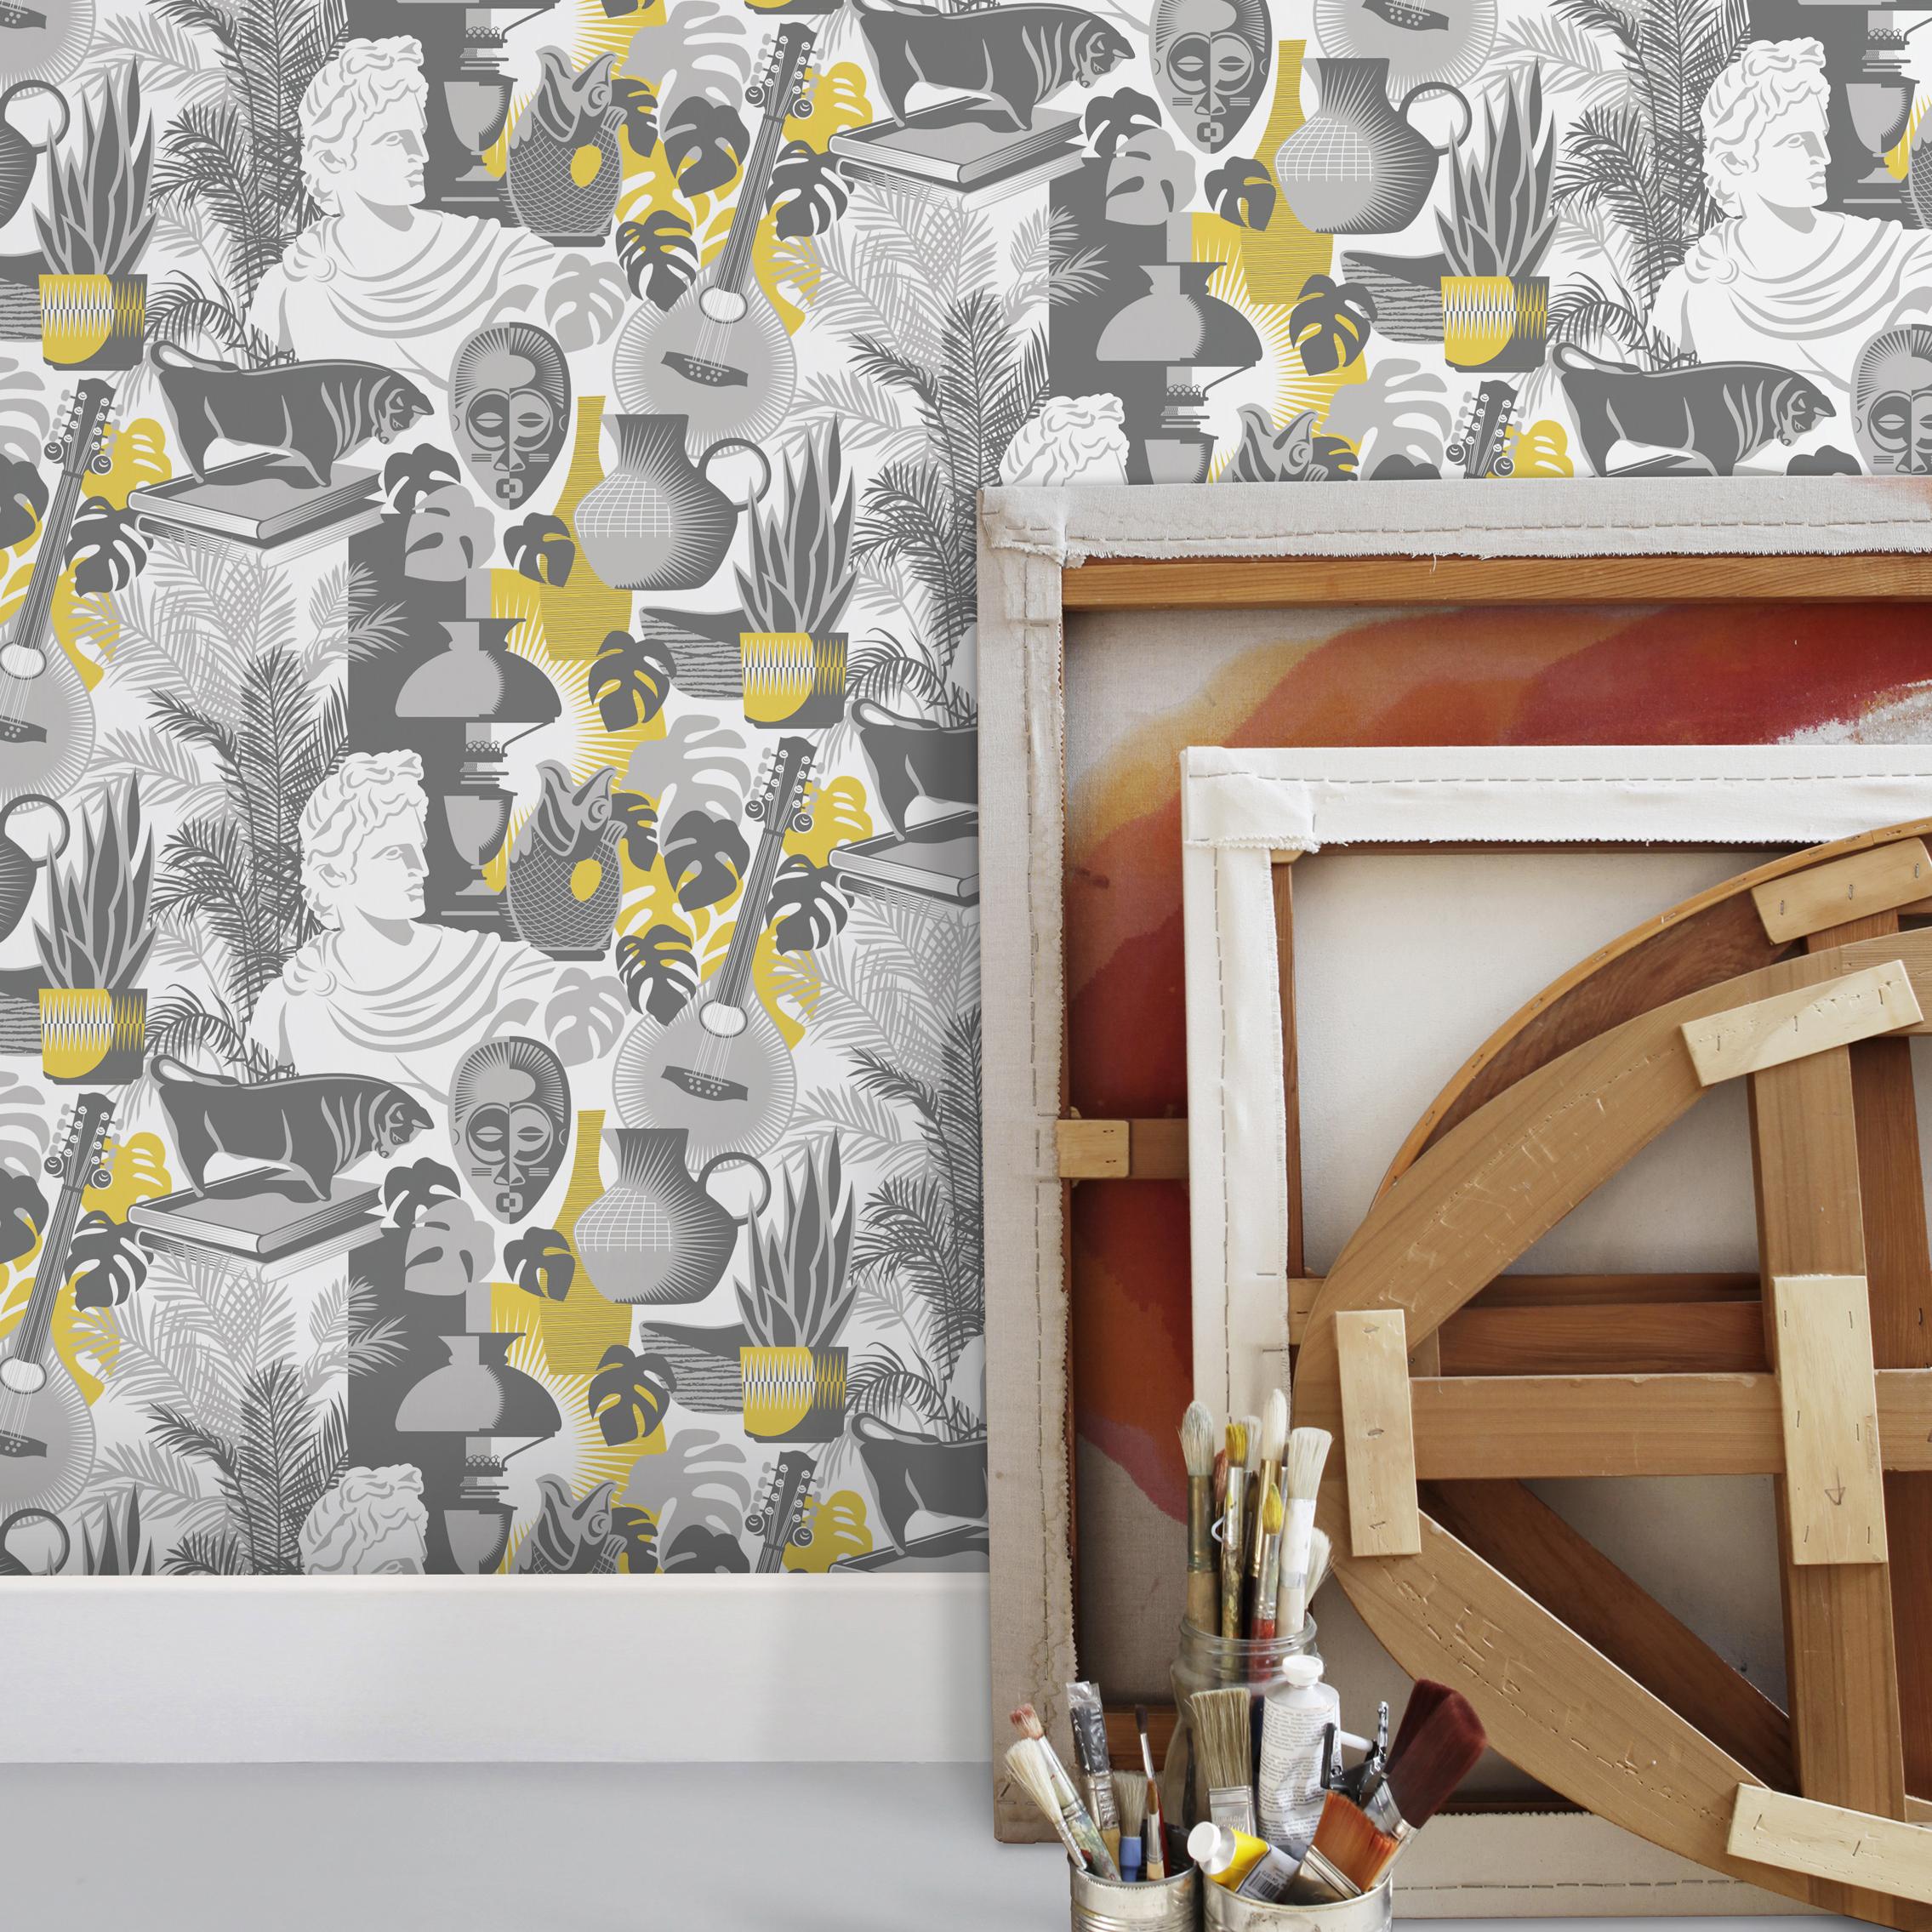 MM_Art_Room_Concrete_insitu.jpg